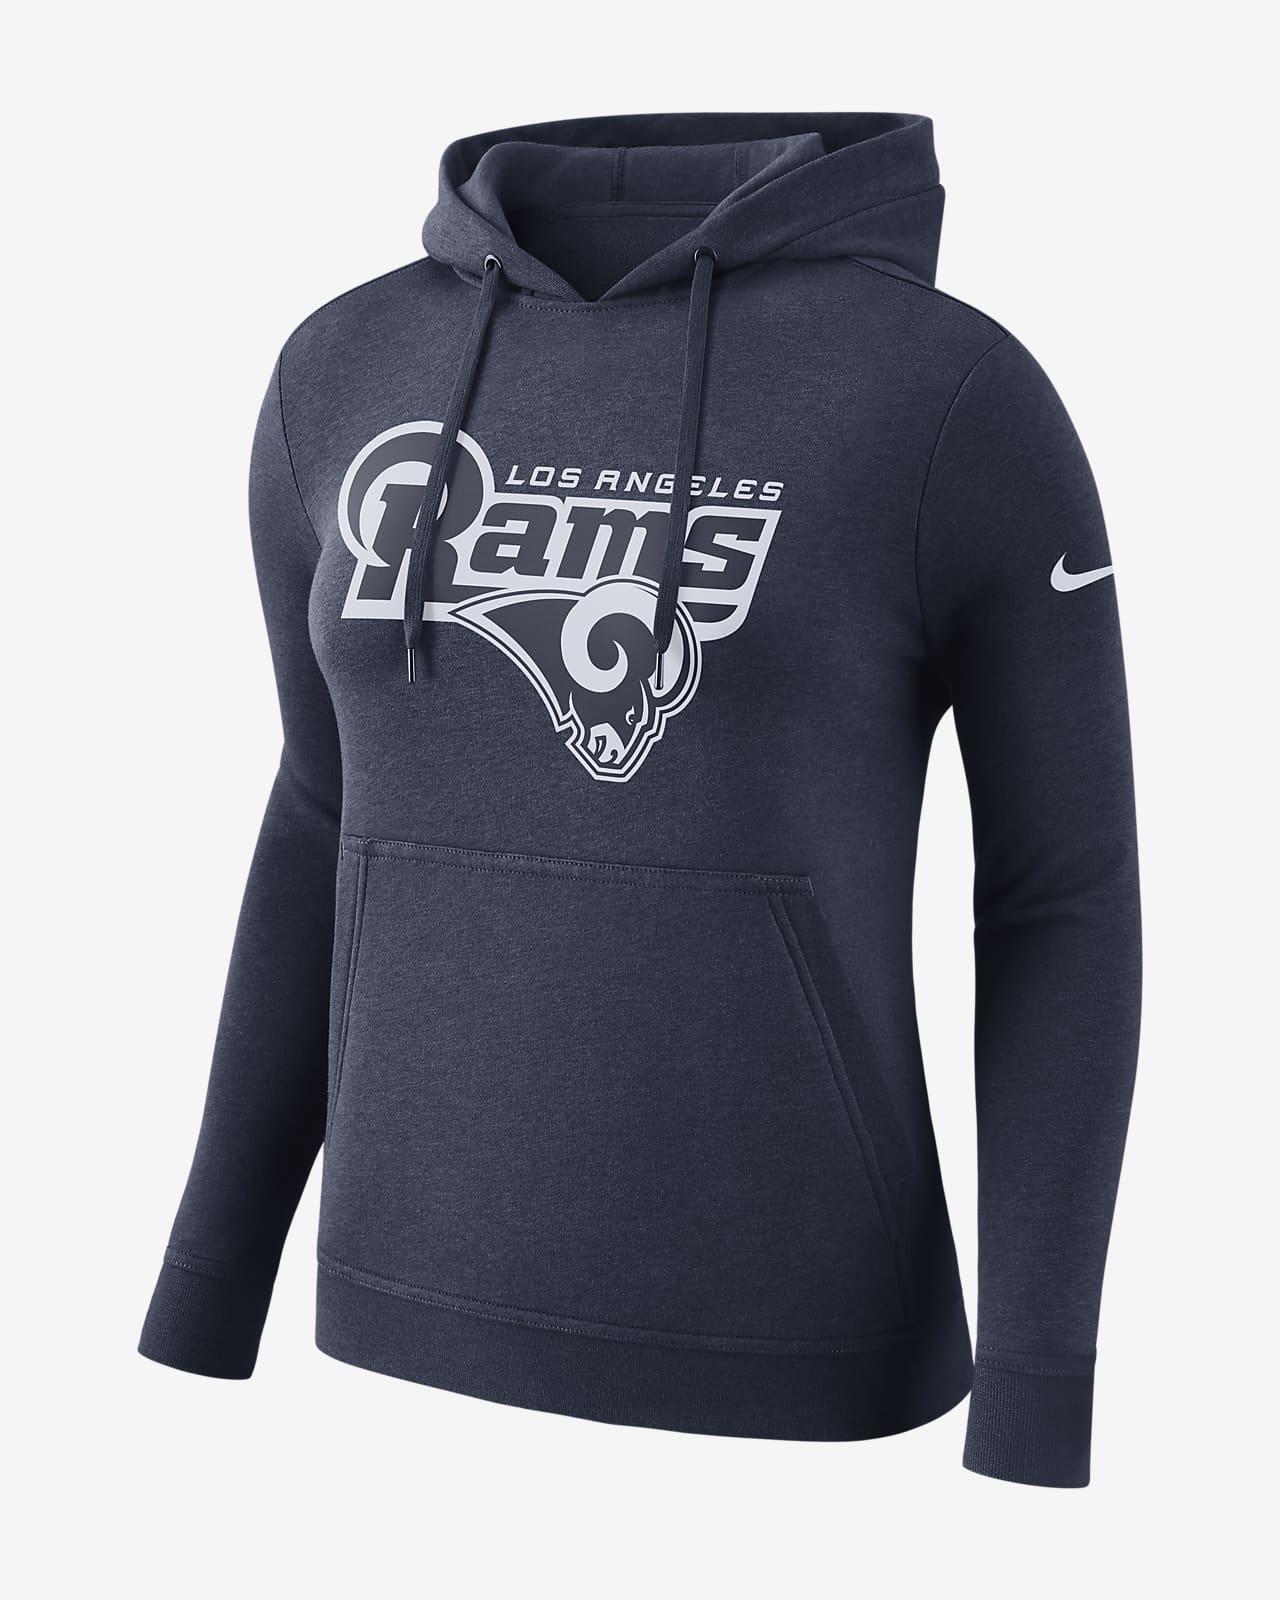 info for huge discount brand new Nike Pulli Logo   Hockey Clothing Hockey Apparel Shopusahockey